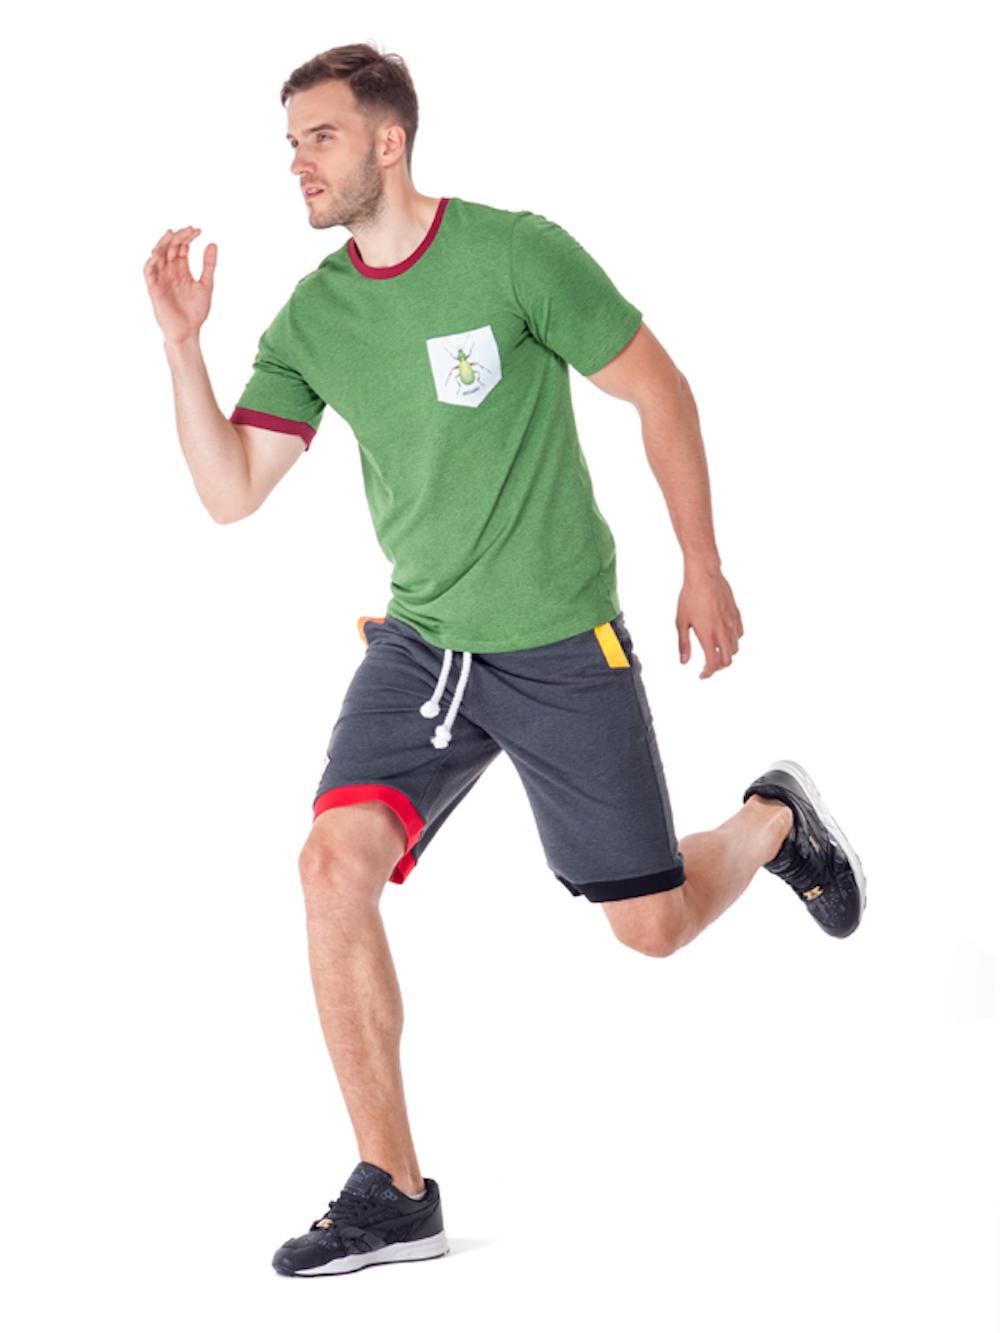 Serpens Shorts  (Graphite) - Okuaku